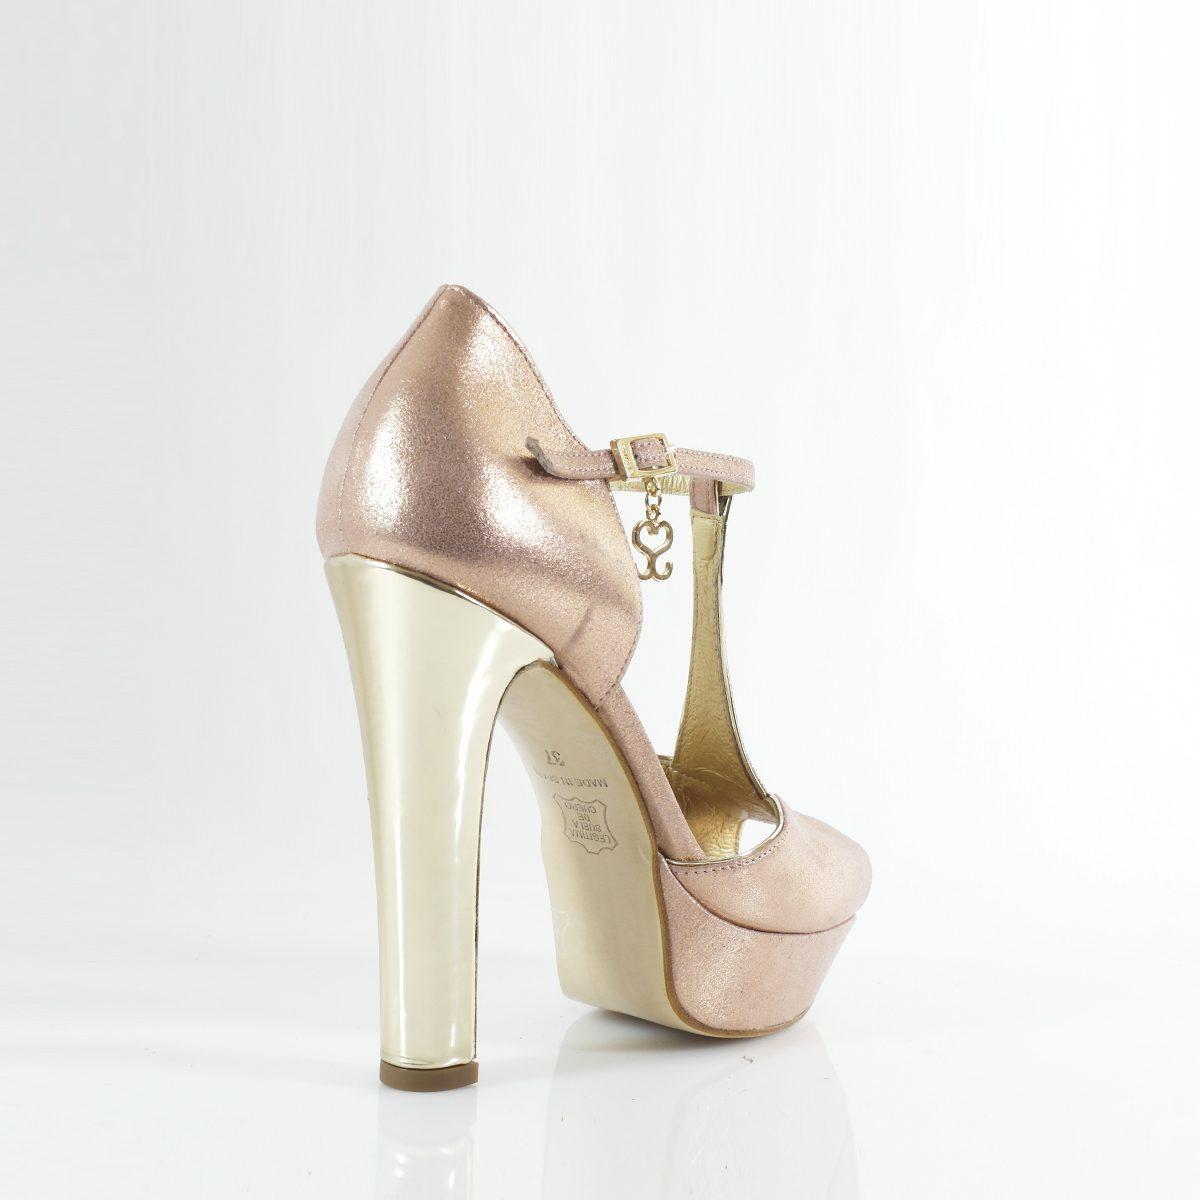 SANDALIA MOD.1960 (12,5cm) - Zapatos Personalizados Invitada